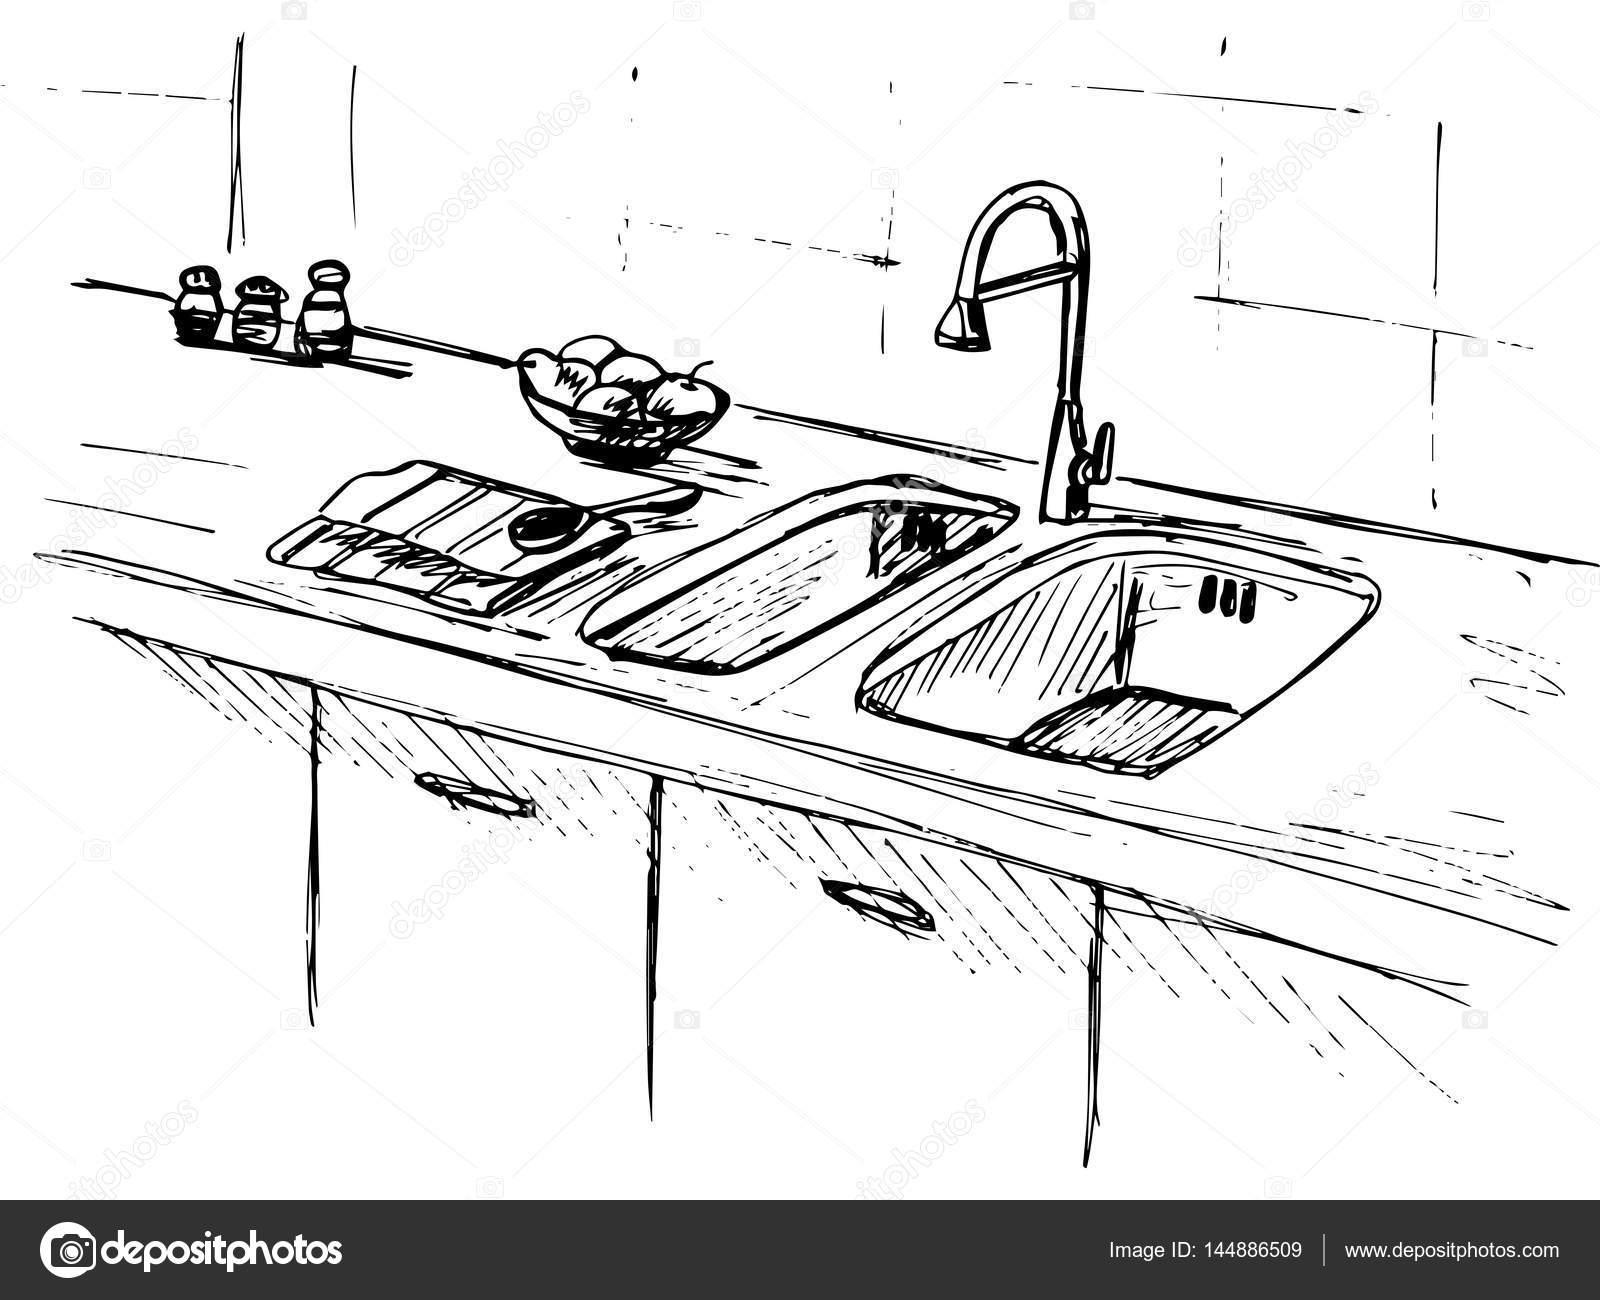 Kitchen Sink Kitchen Worktop With Sink The Sketch Of The